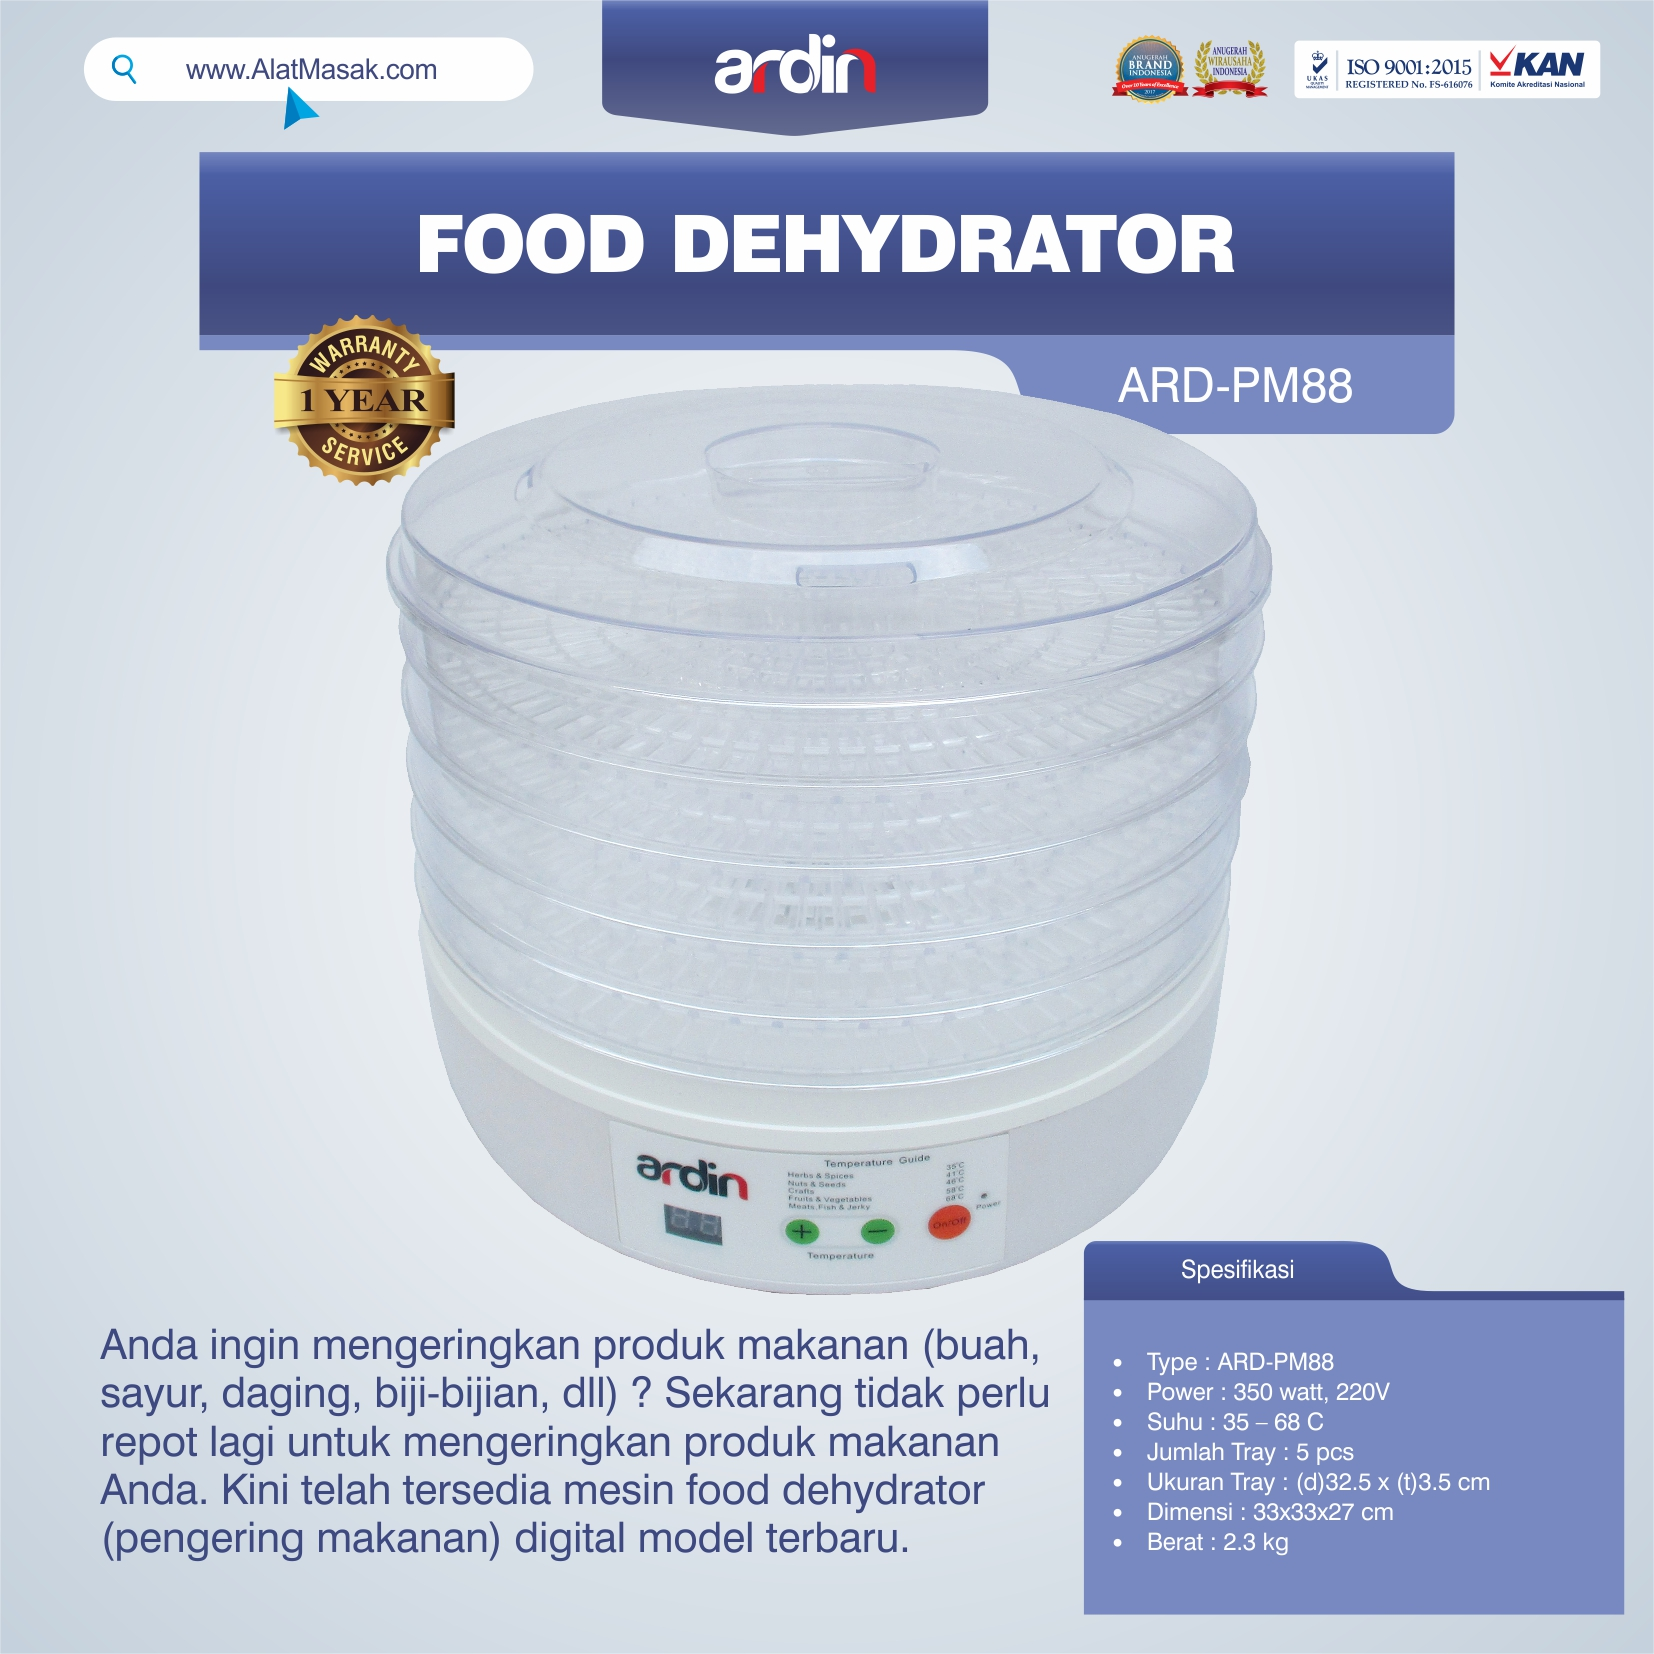 Jual Food Dehydrator ARD-PM88 di Malang